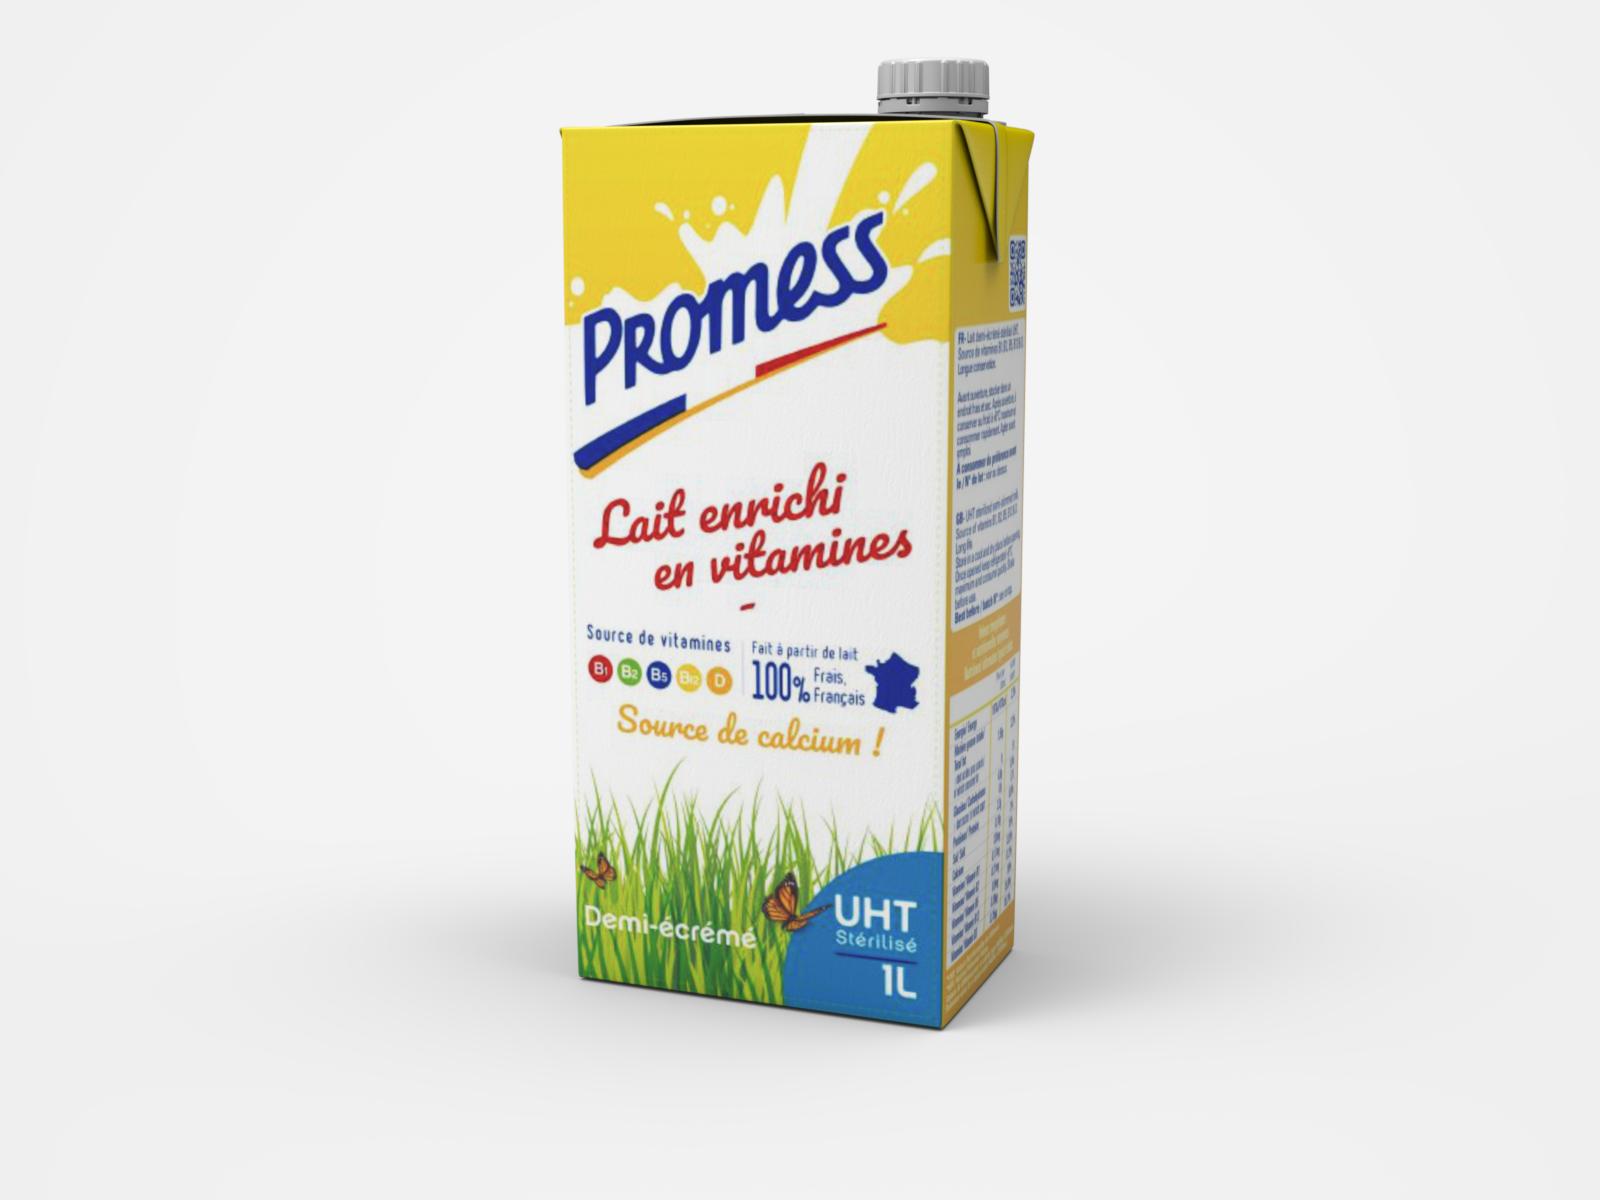 1L Brick Vitamin enriched milk - Front view